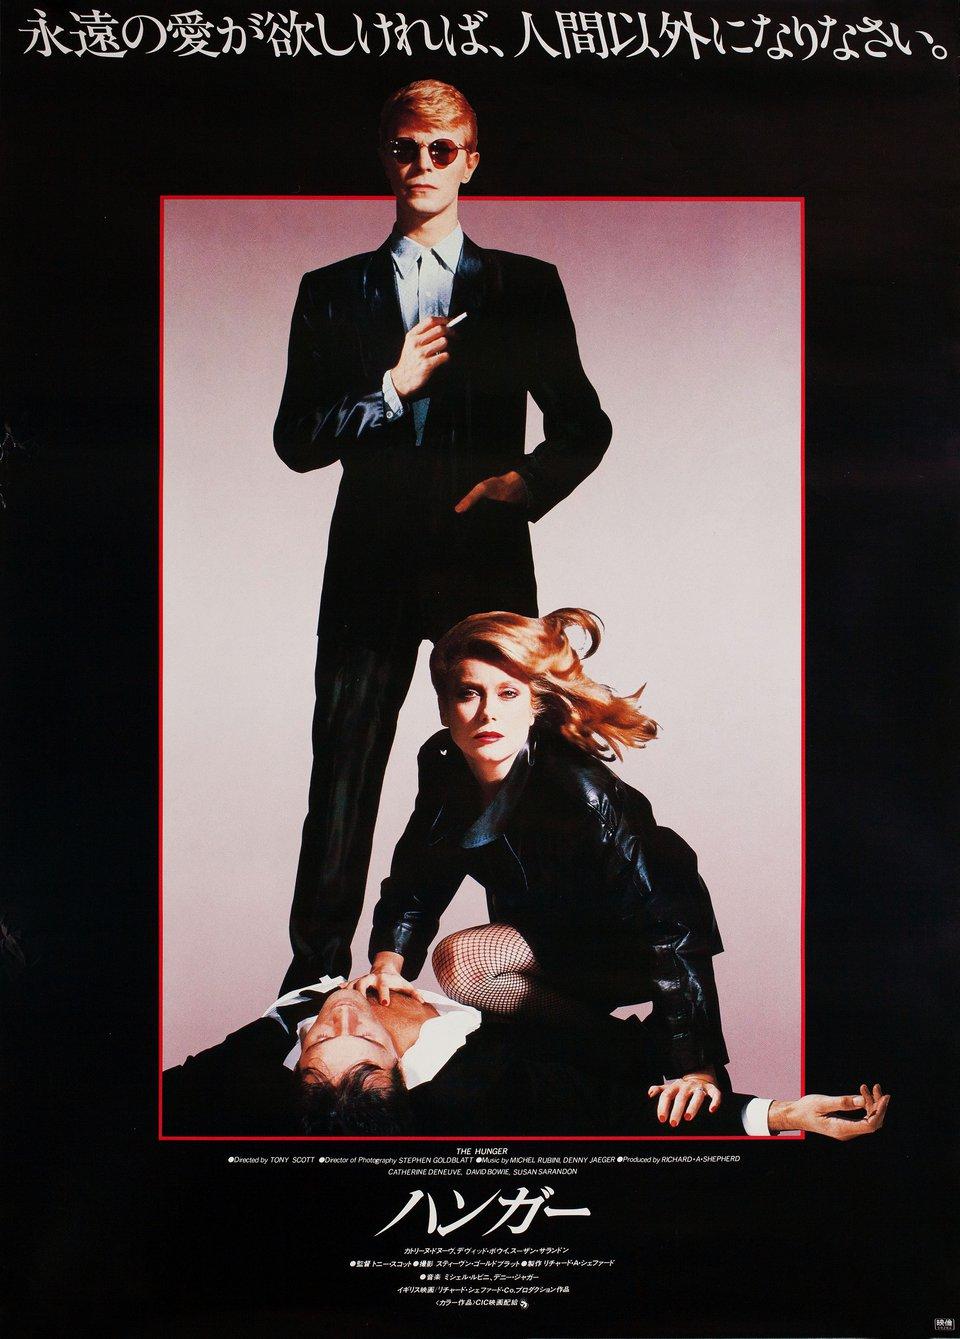 The Hunger 1983 Japanese B2 Poster Posteritati Movie Poster Gallery New York Japanese Movie Poster The Hunger Film Japanese Poster